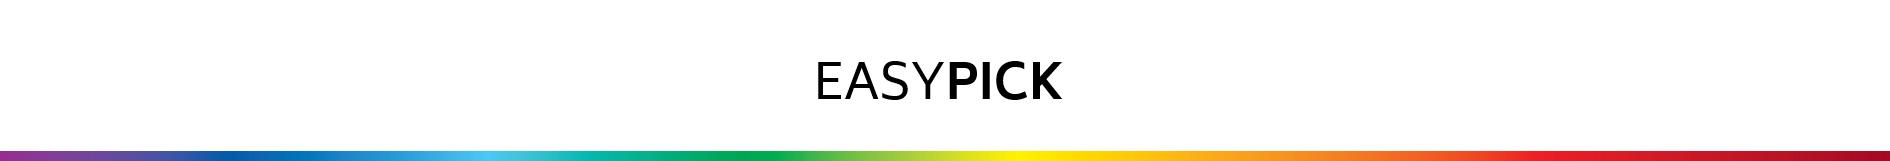 EasyPick